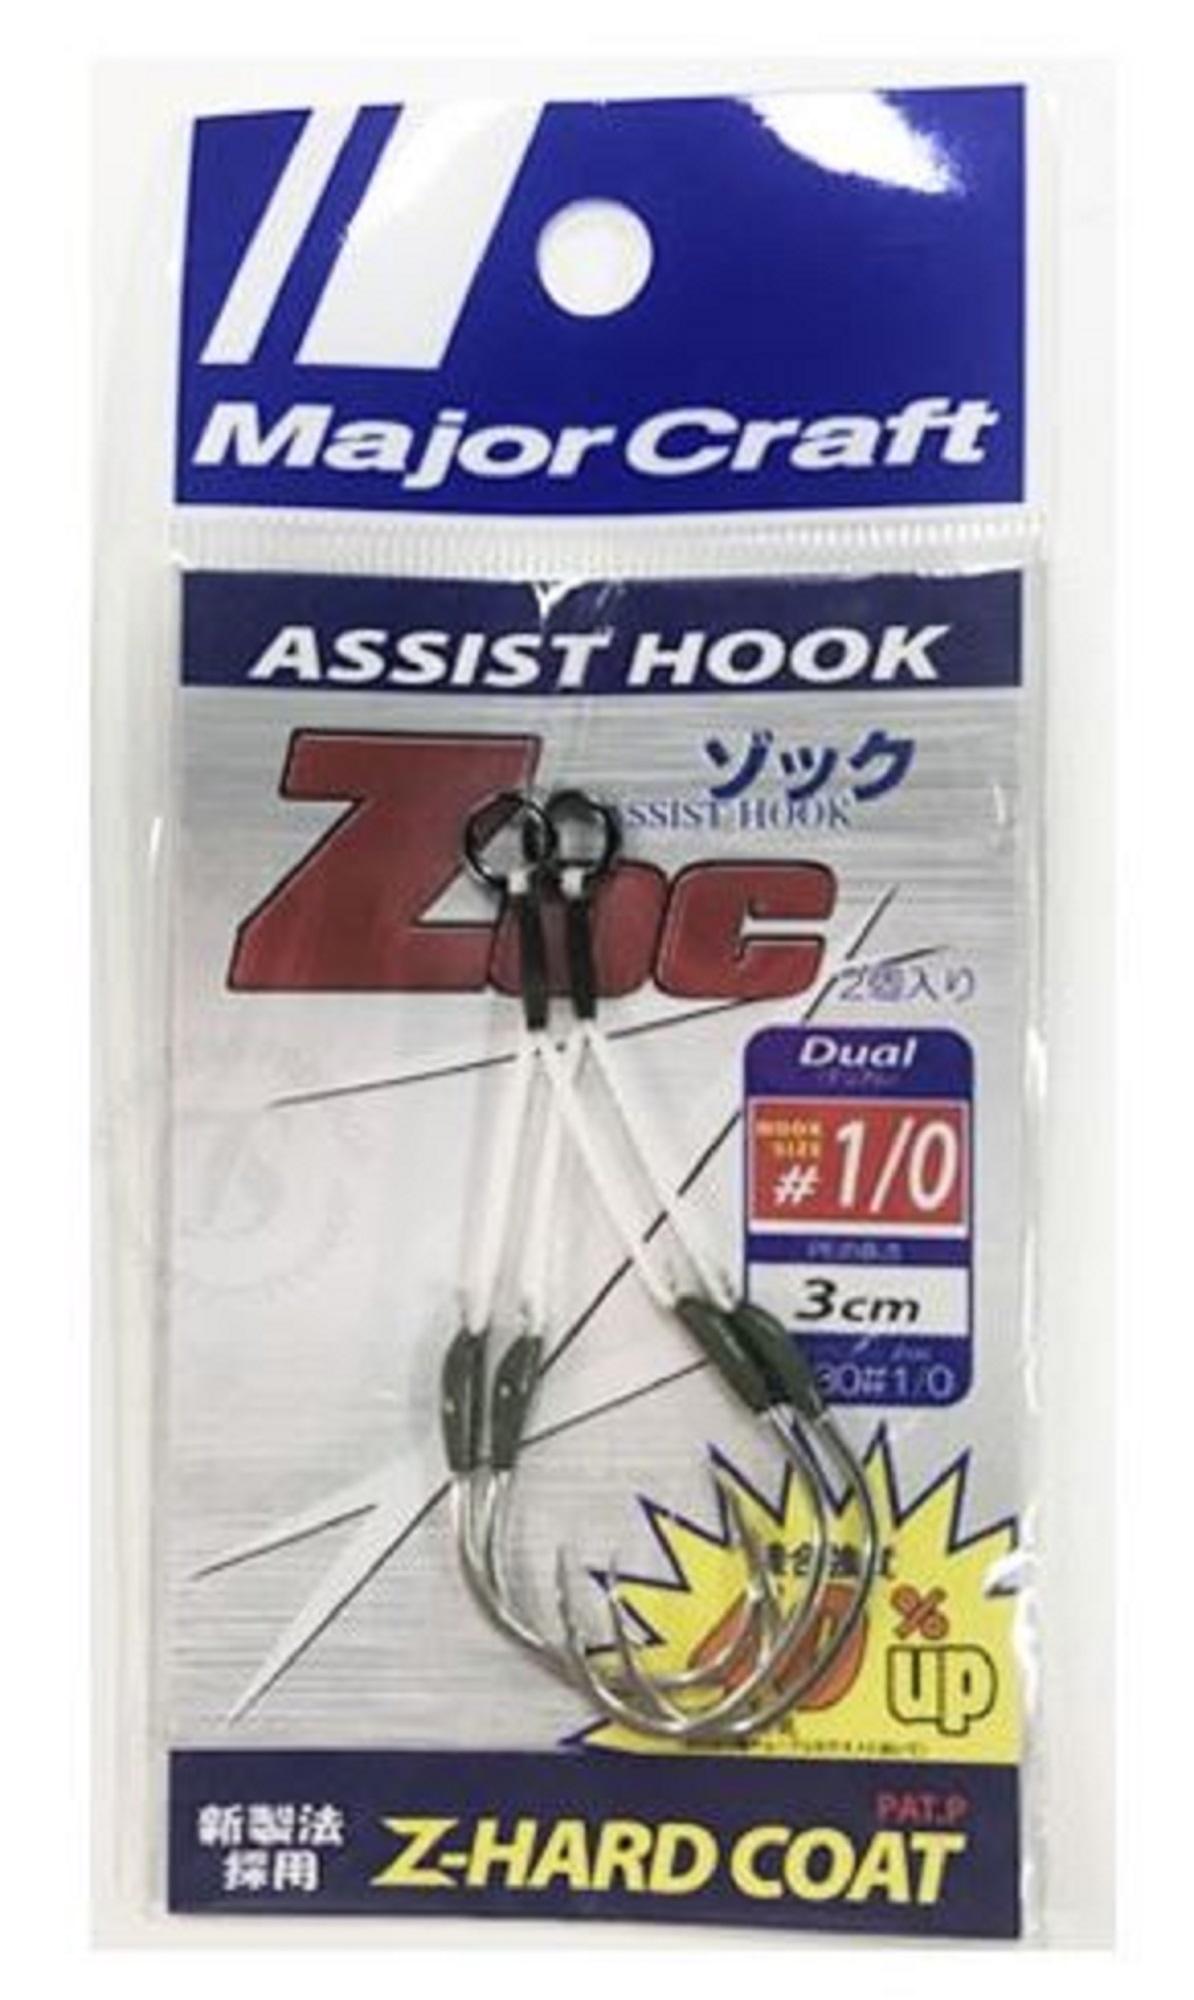 Major Craft ZOC Assist Hook Single ZOC-HD30 Size 1/0 , 3 cm 2sets/pack (0116)